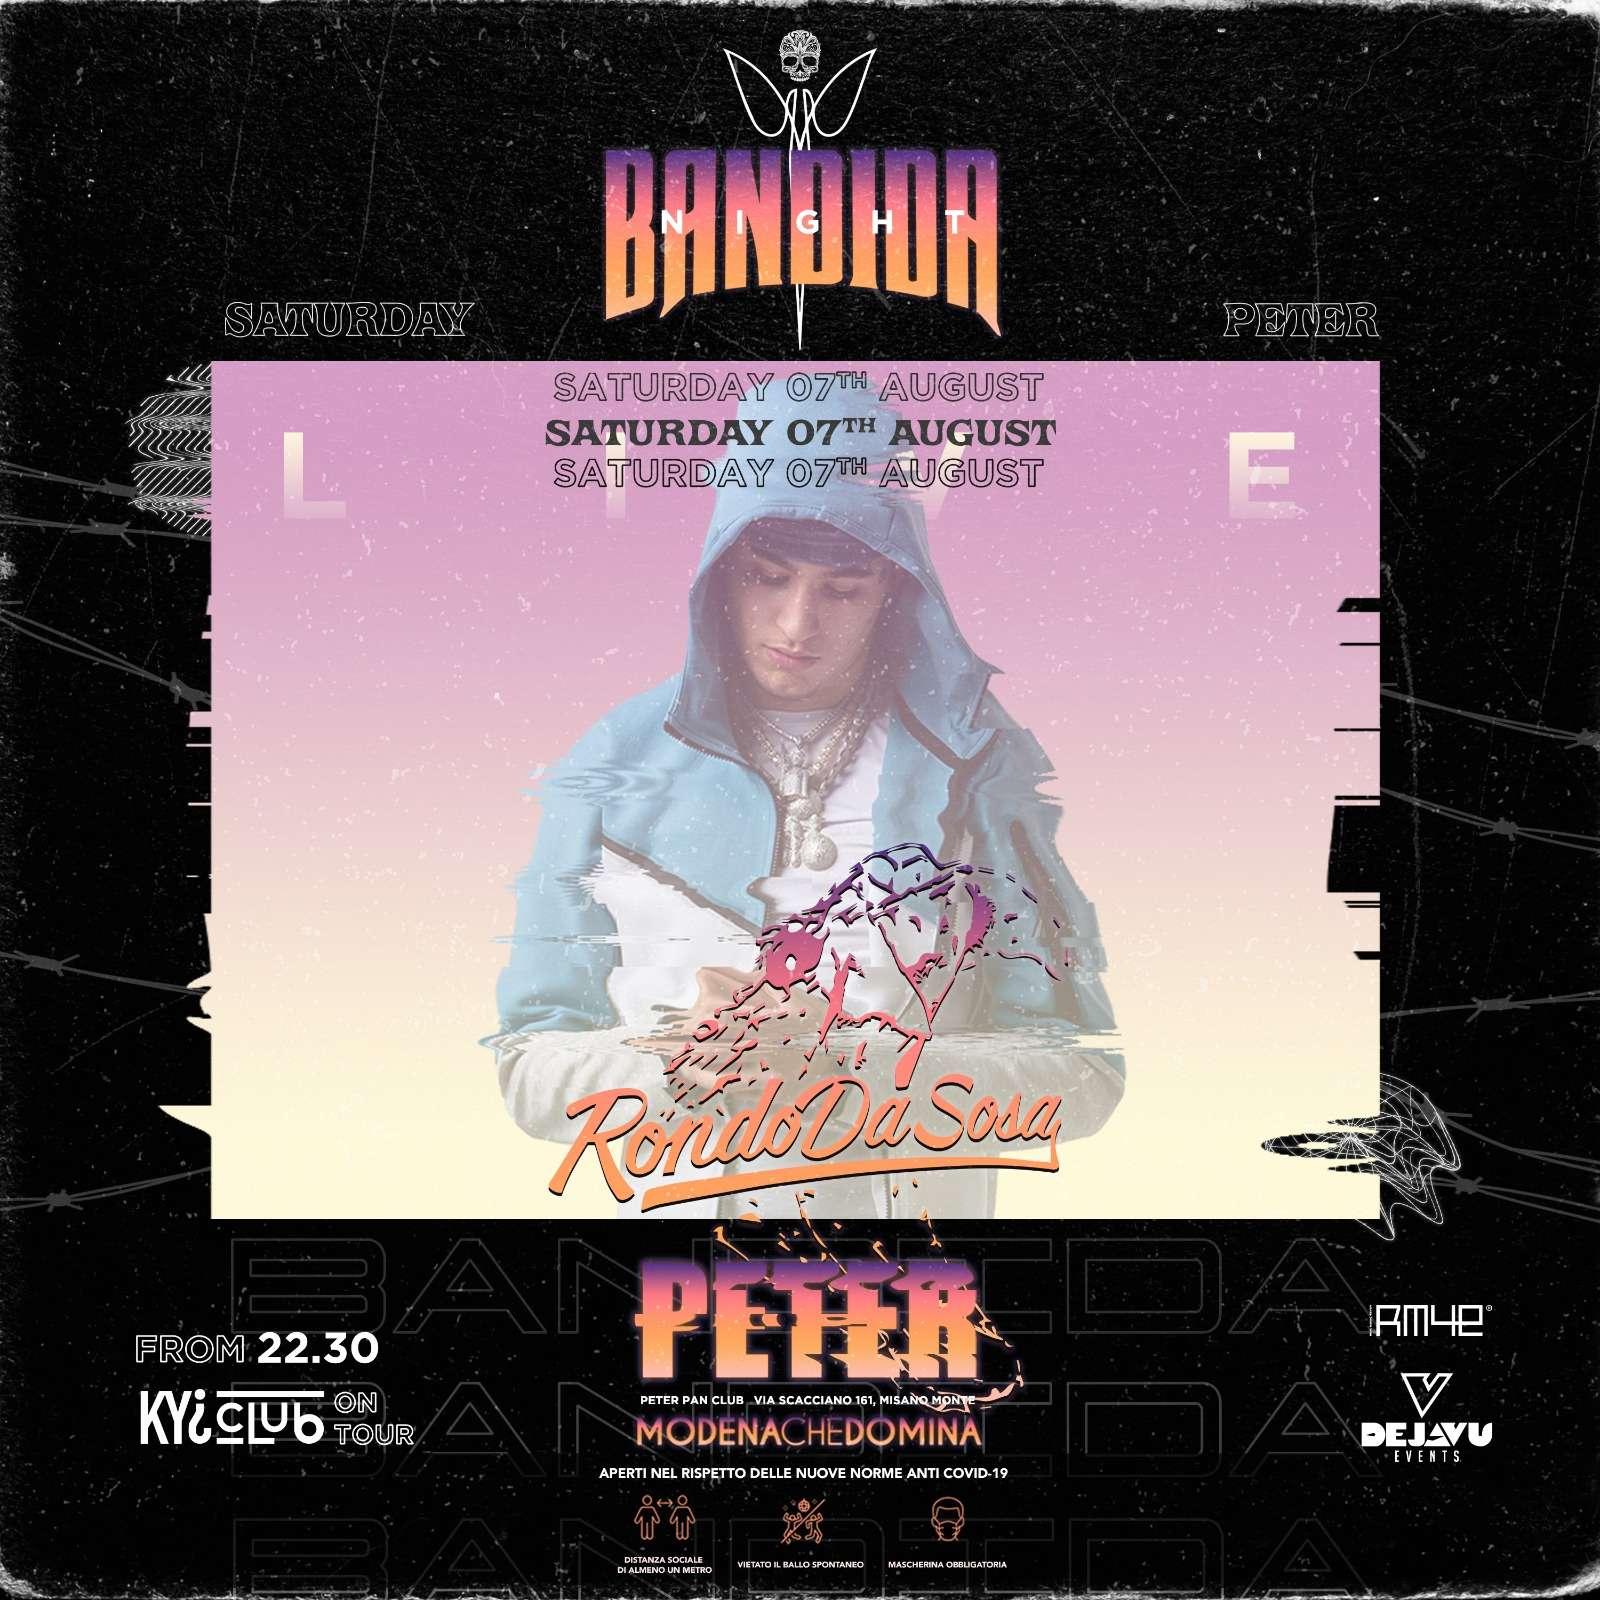 BANDIDA w/ RONDO - SABATO 7 AGOSTO Peter Pan Club / RN